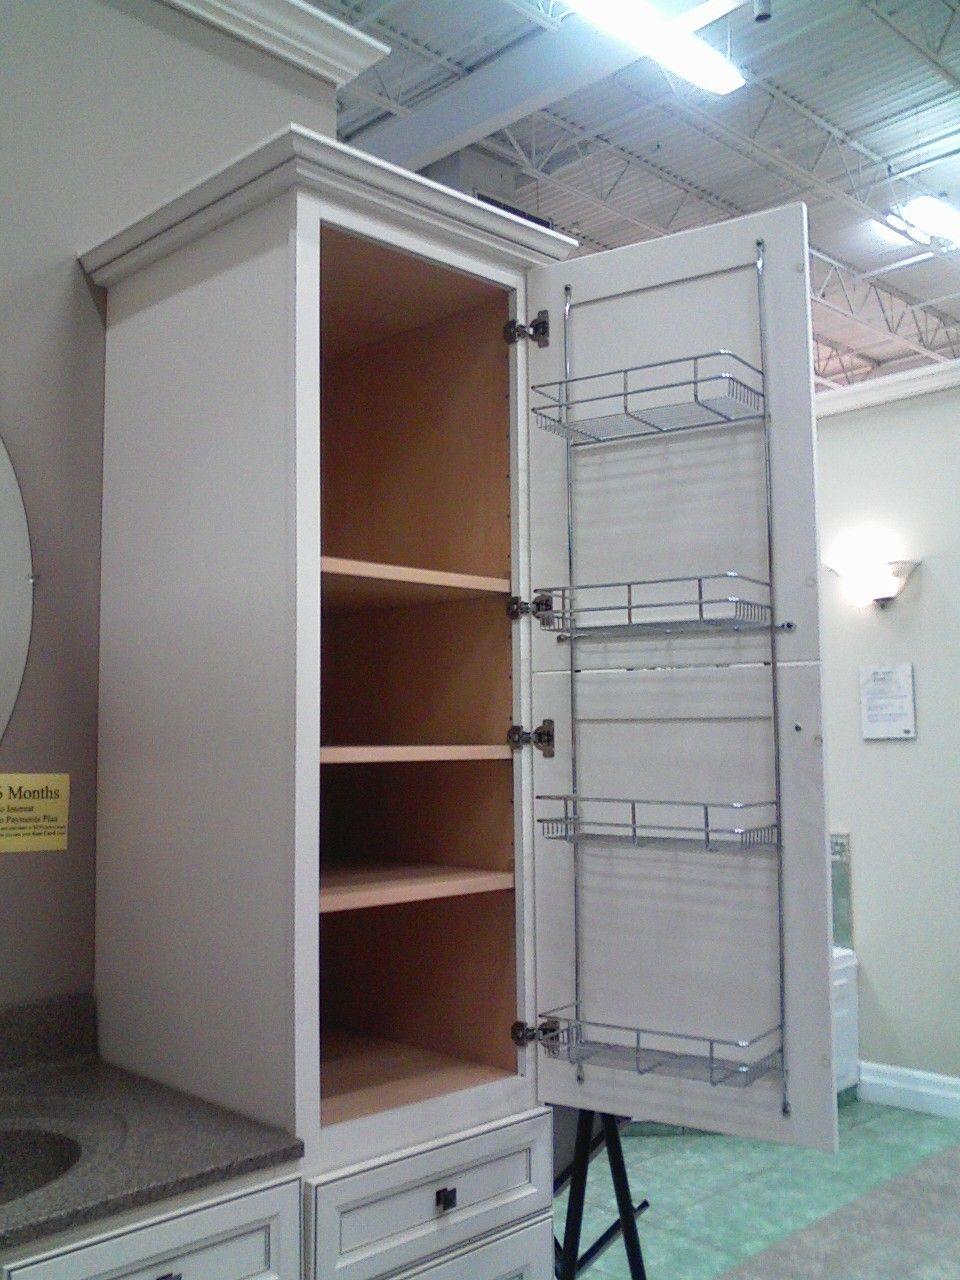 Superbe Wire Shelves Inside Cabinet  Good For Extra Shampoo Bottles, Bars Of Soap,